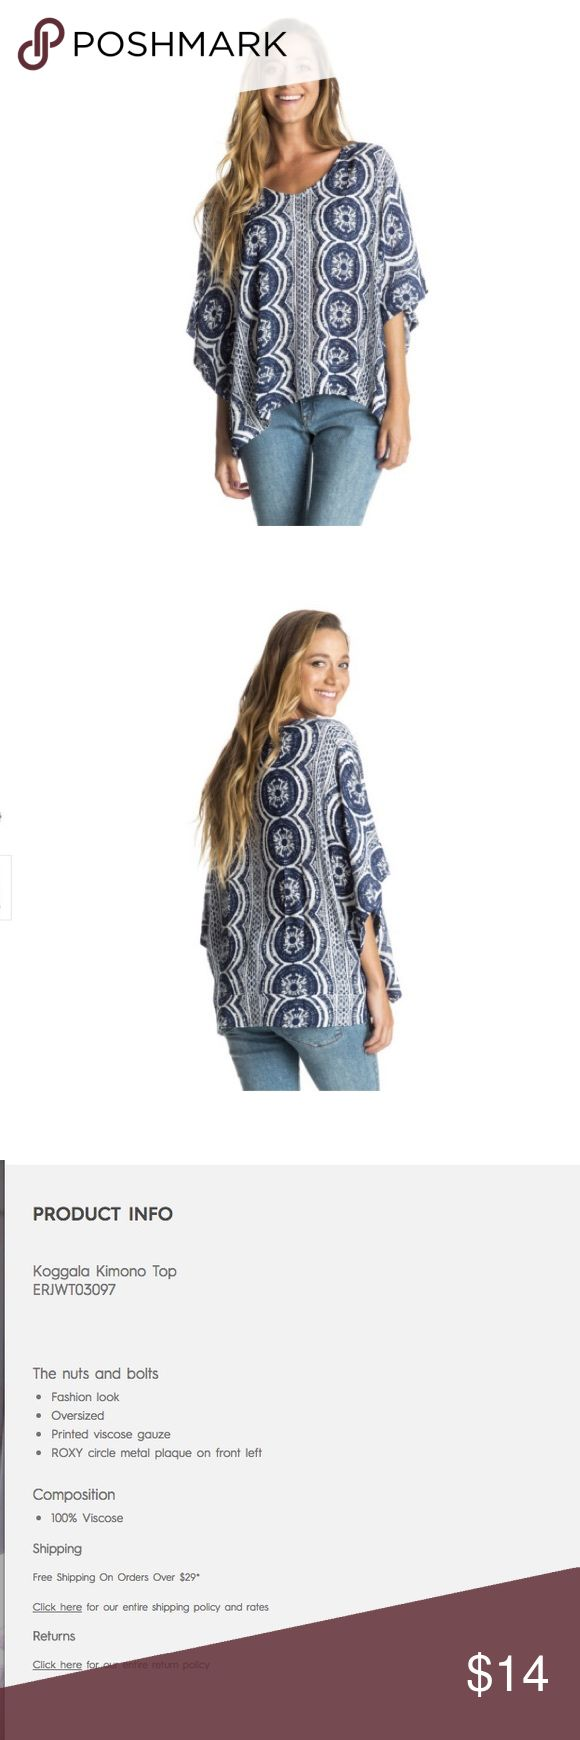 Roxy kimona shirt 100% viscose, only worn once, roxy tribal print kimono shirt Roxy Tops